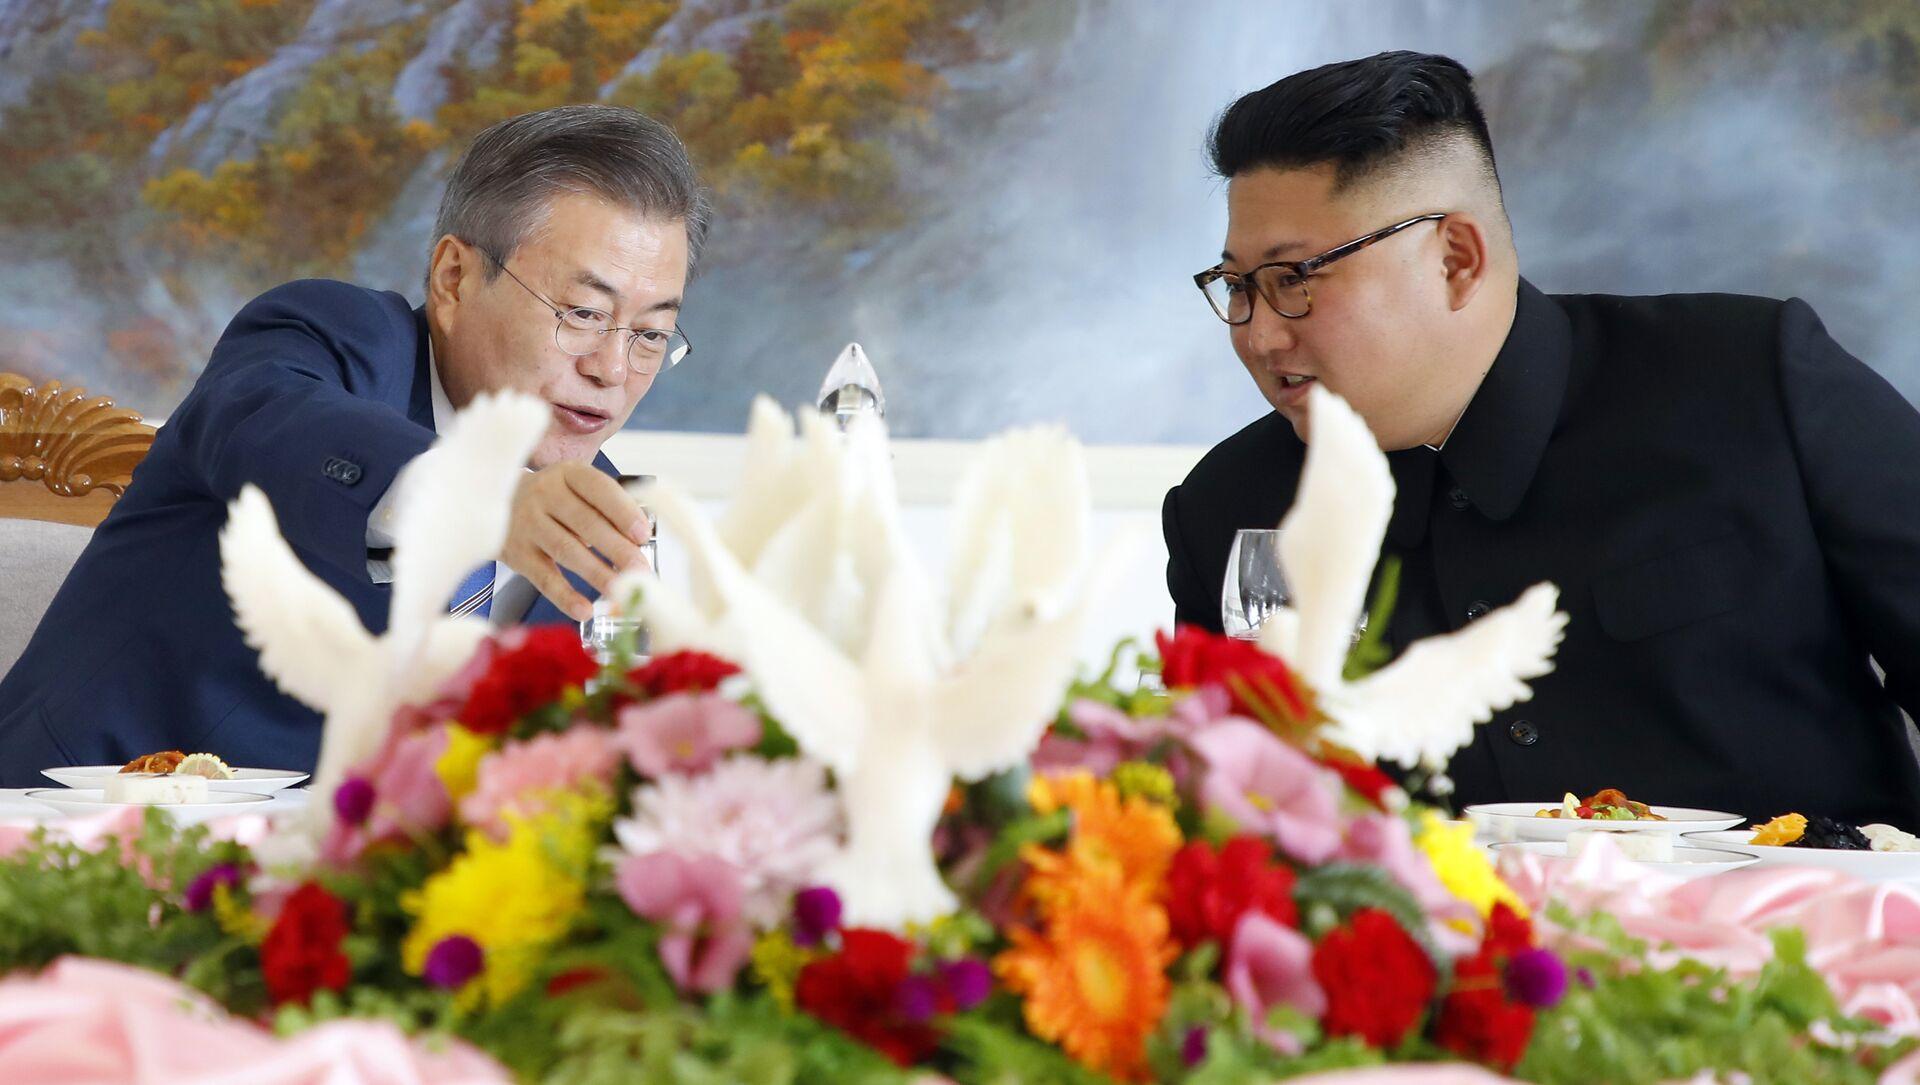 South Korean President Moon Jae-in, left, talks with North Korean leader Kim Jong Un at Okryu-Gwan restaurant in Pyongyang, North Korea, Wednesday, Sept. 19, 2018 - Sputnik International, 1920, 27.07.2021